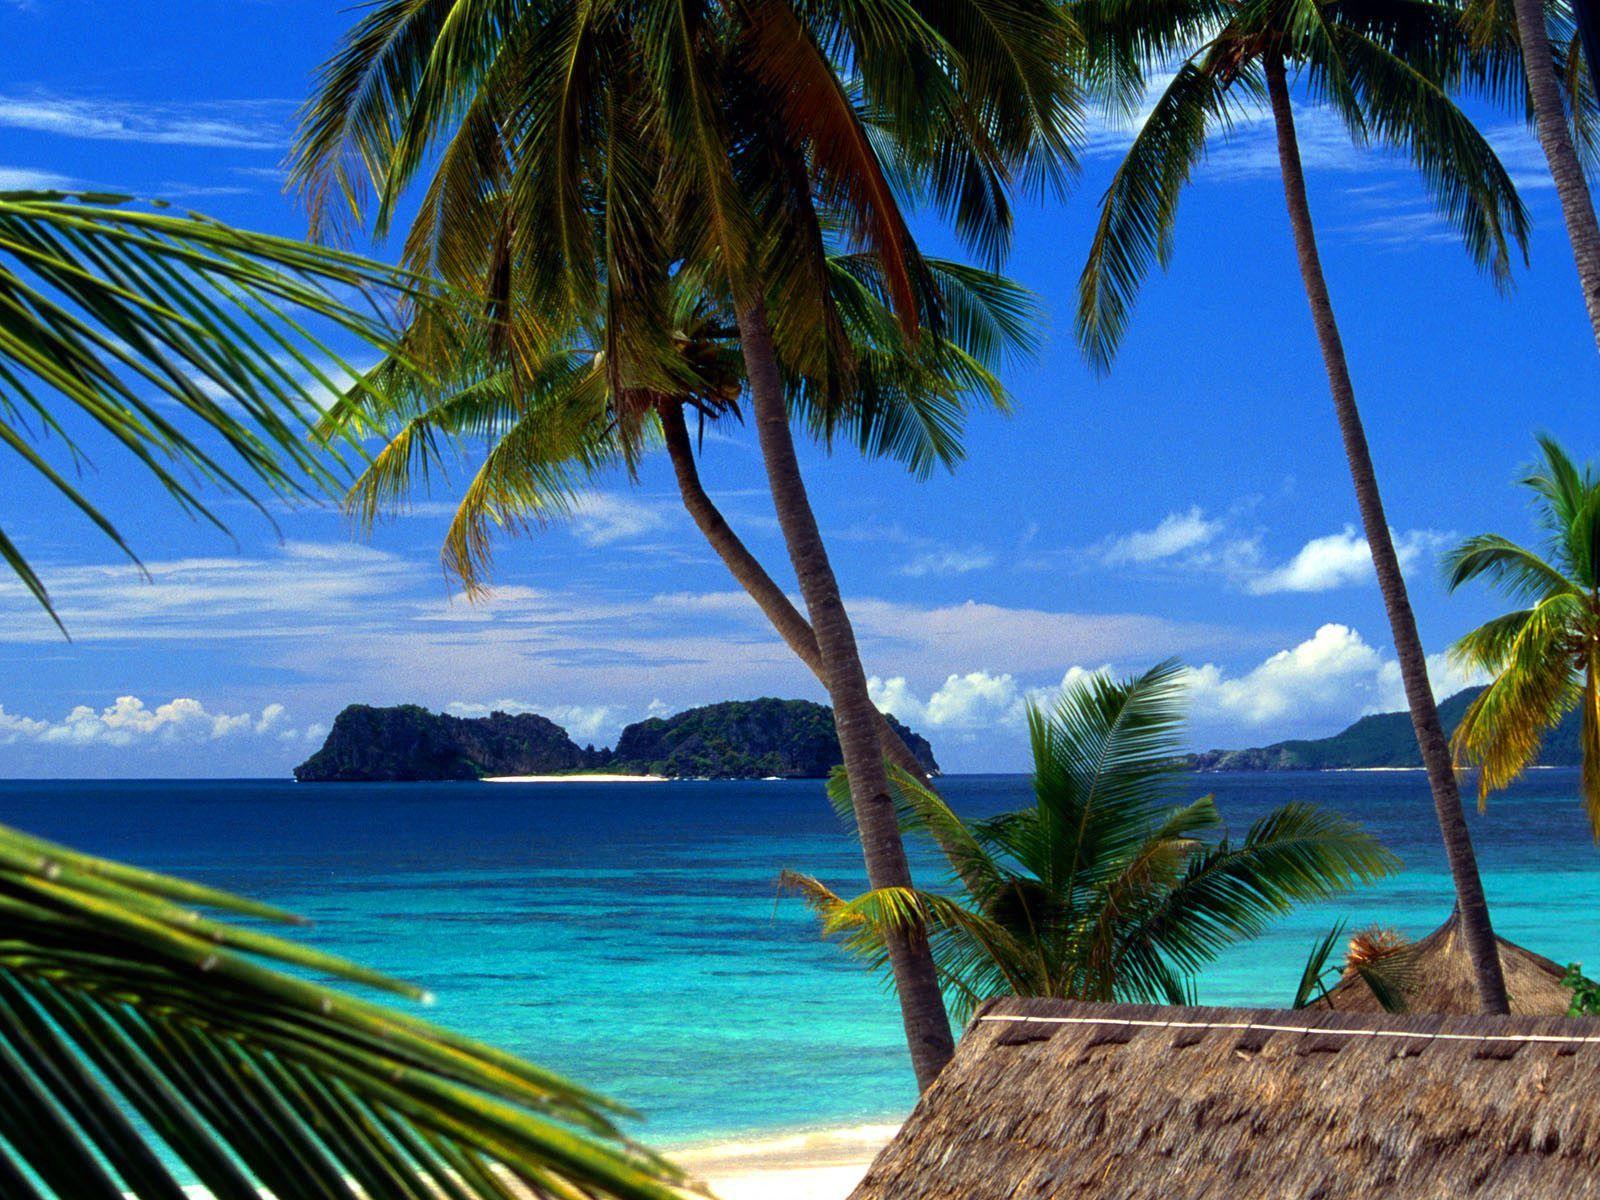 El Nido, Palawan Philippines - Nice Pictures-6422